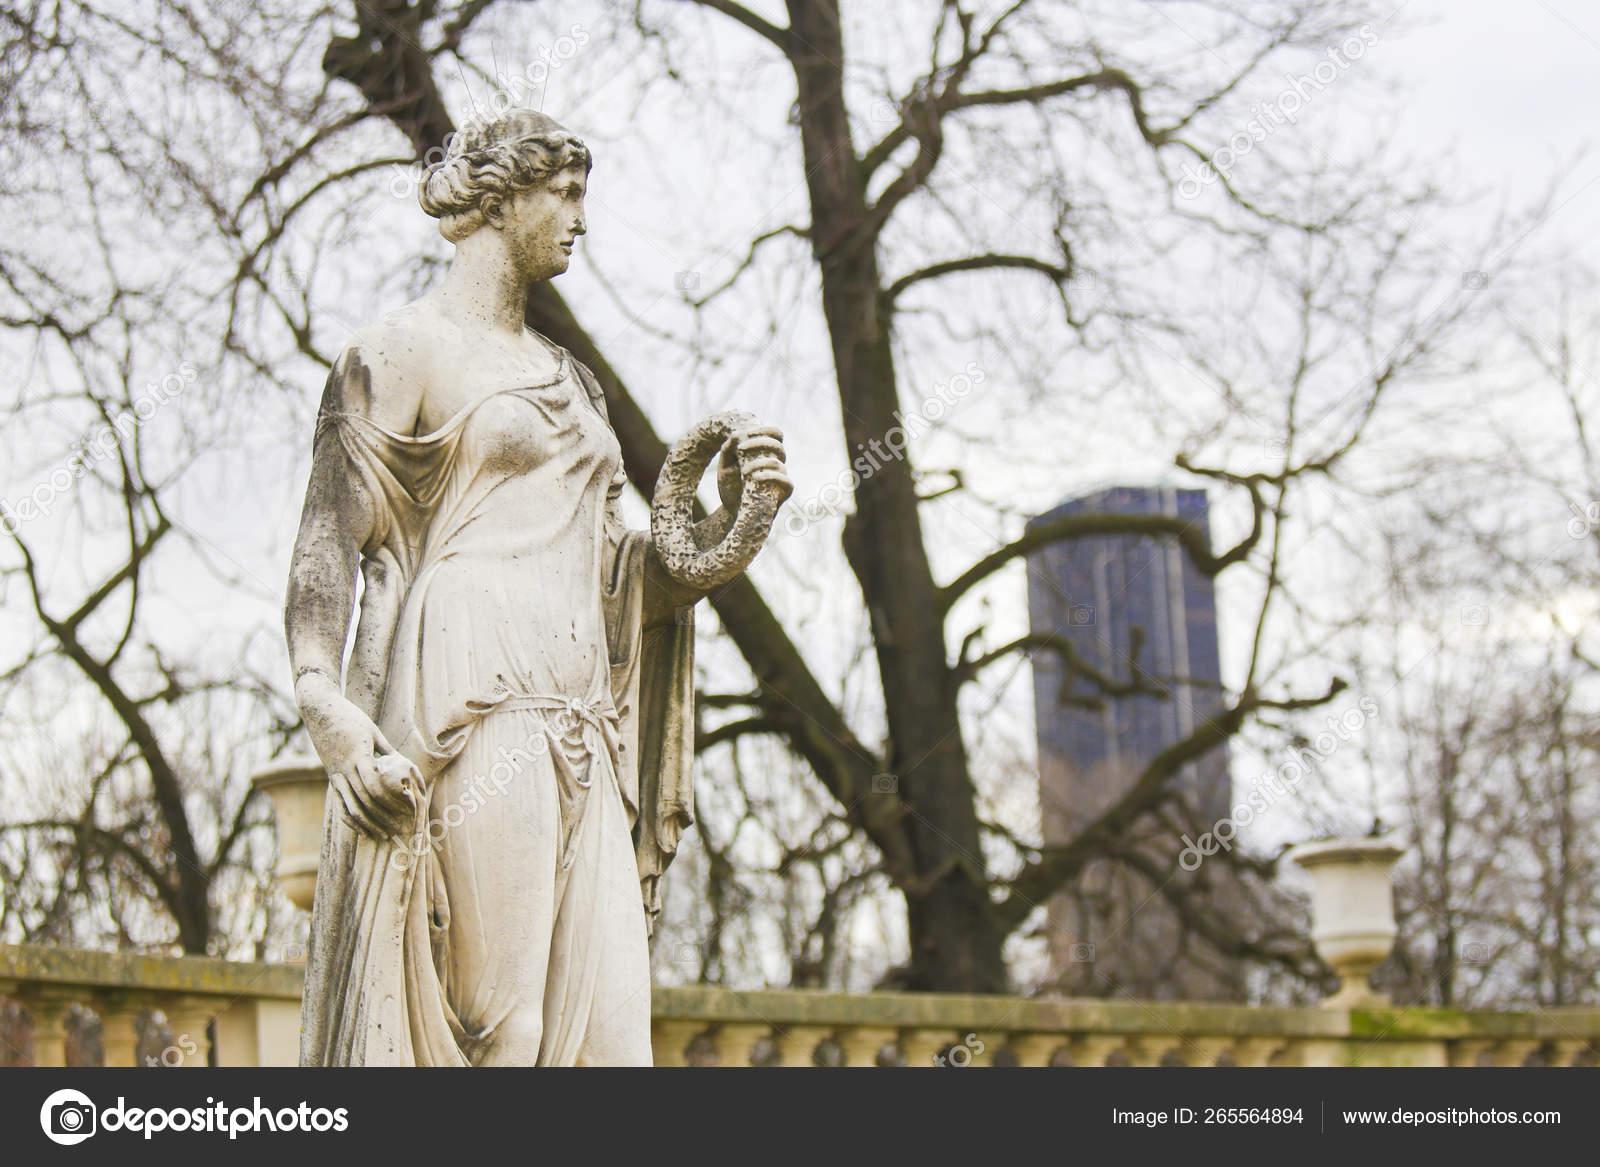 statue of flora in the jardin du luxembourg paris france stock photo c jorisvo 265564894